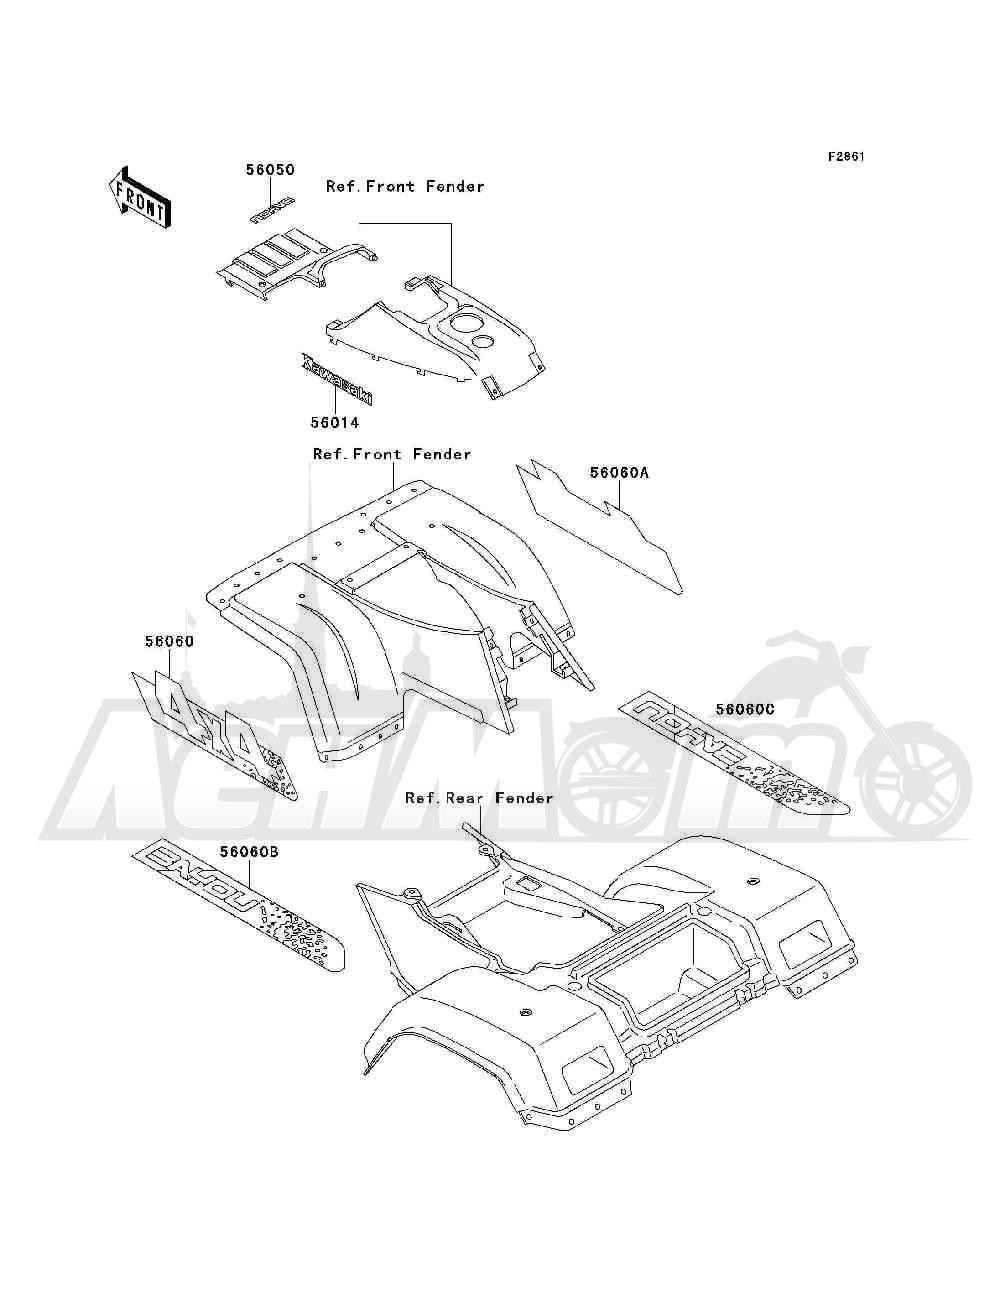 Запчасти для Квадроцикла Kawasaki 1993 BAYOU 300 4X4 (KLF300-C5) Раздел: DECALS(EBONY)(KLF300-C5) | наклейки (EBONY) (KLF300 C5)